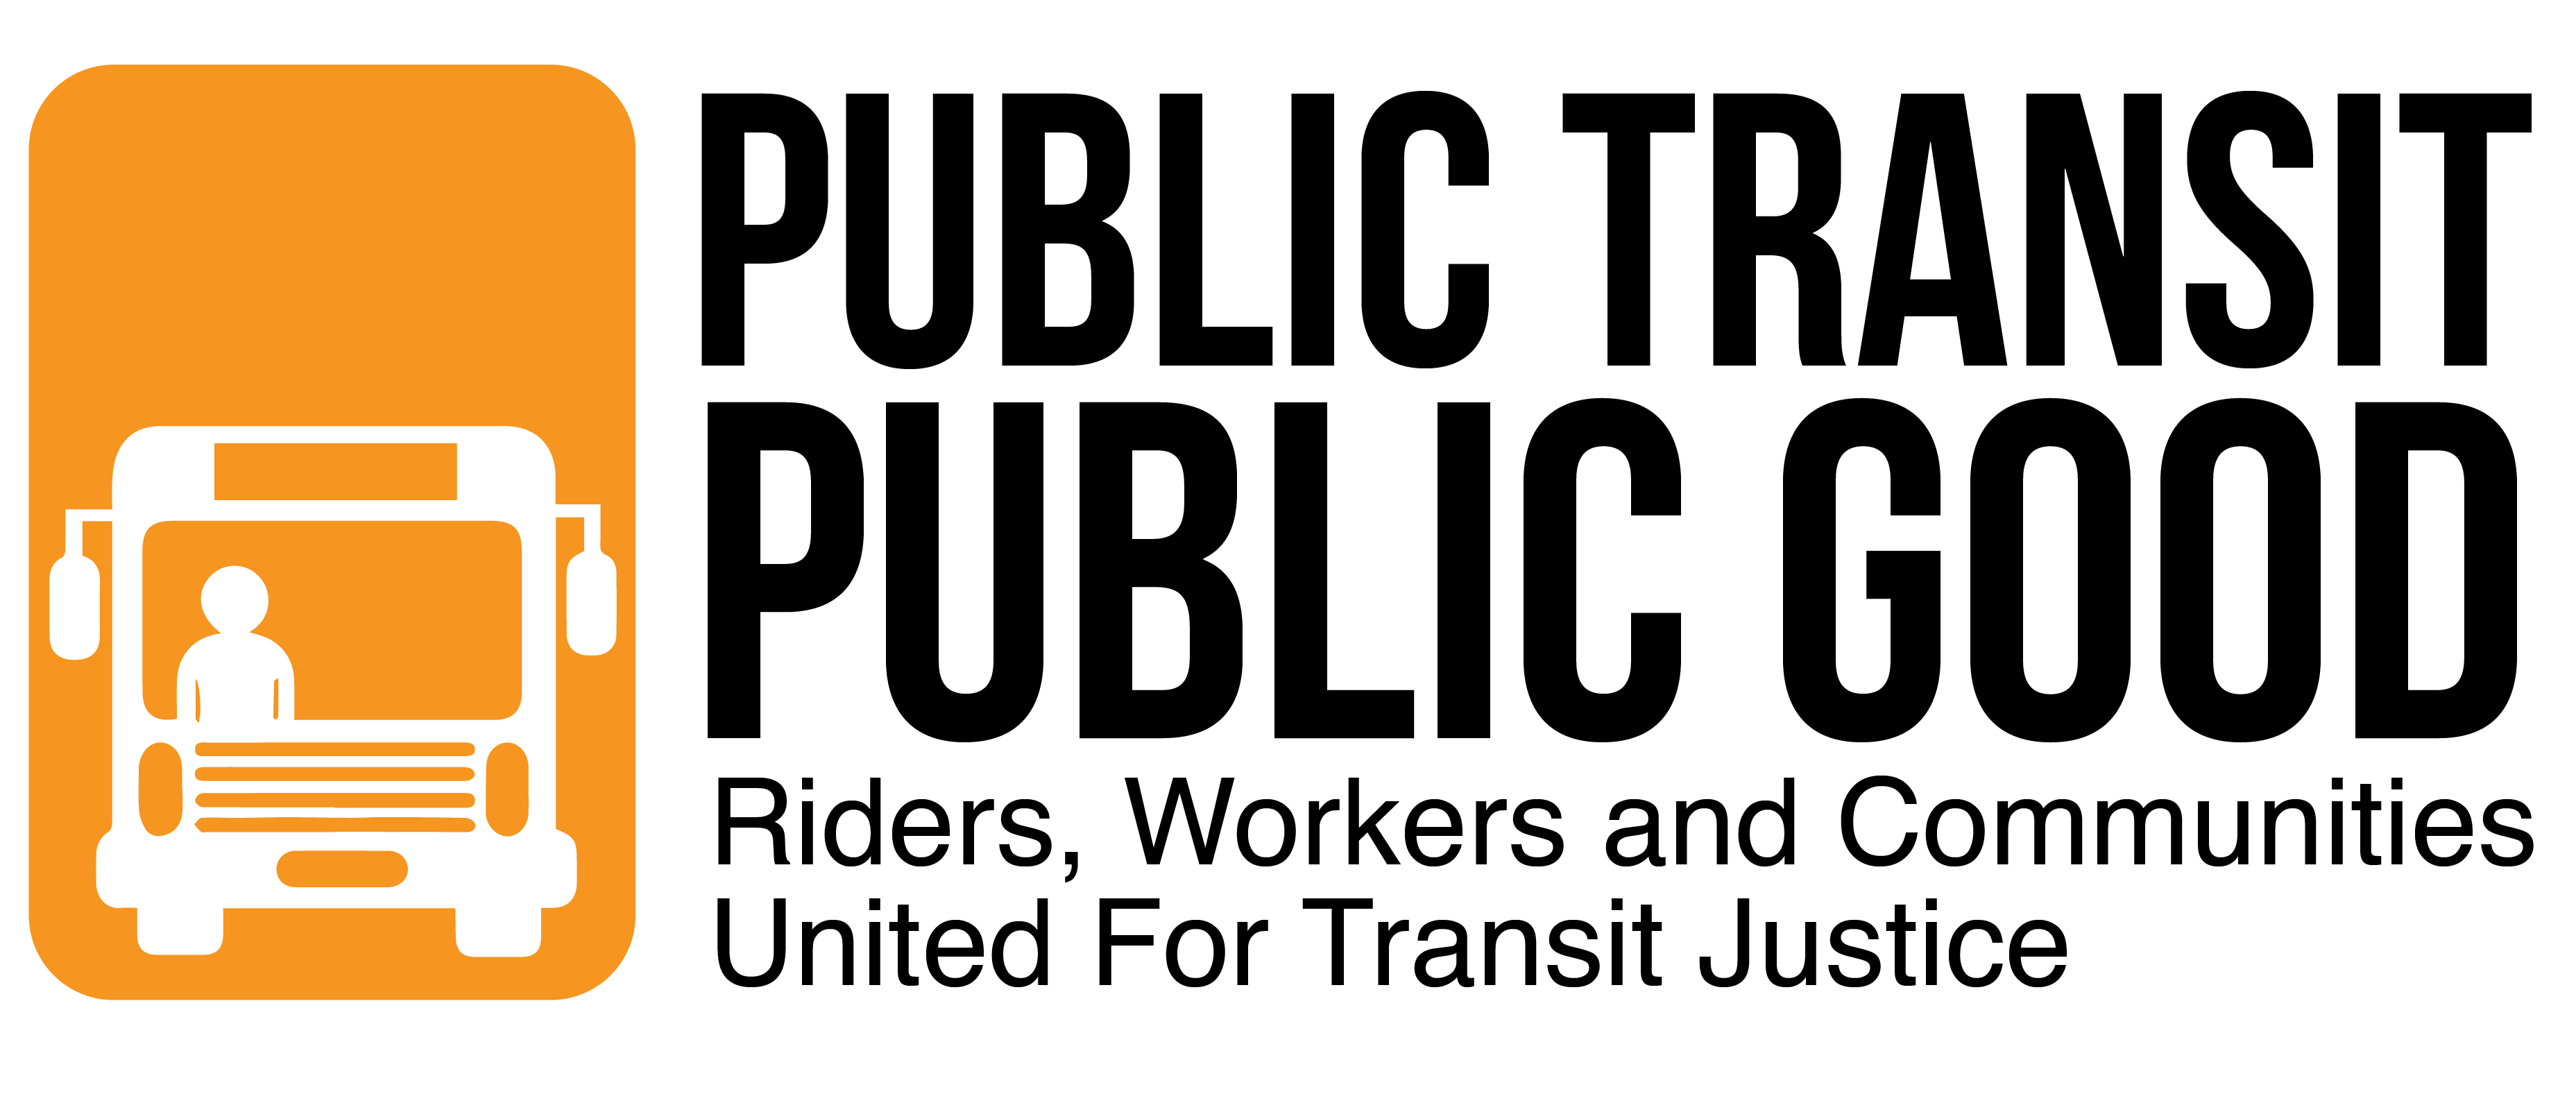 Public Transit - Public Good